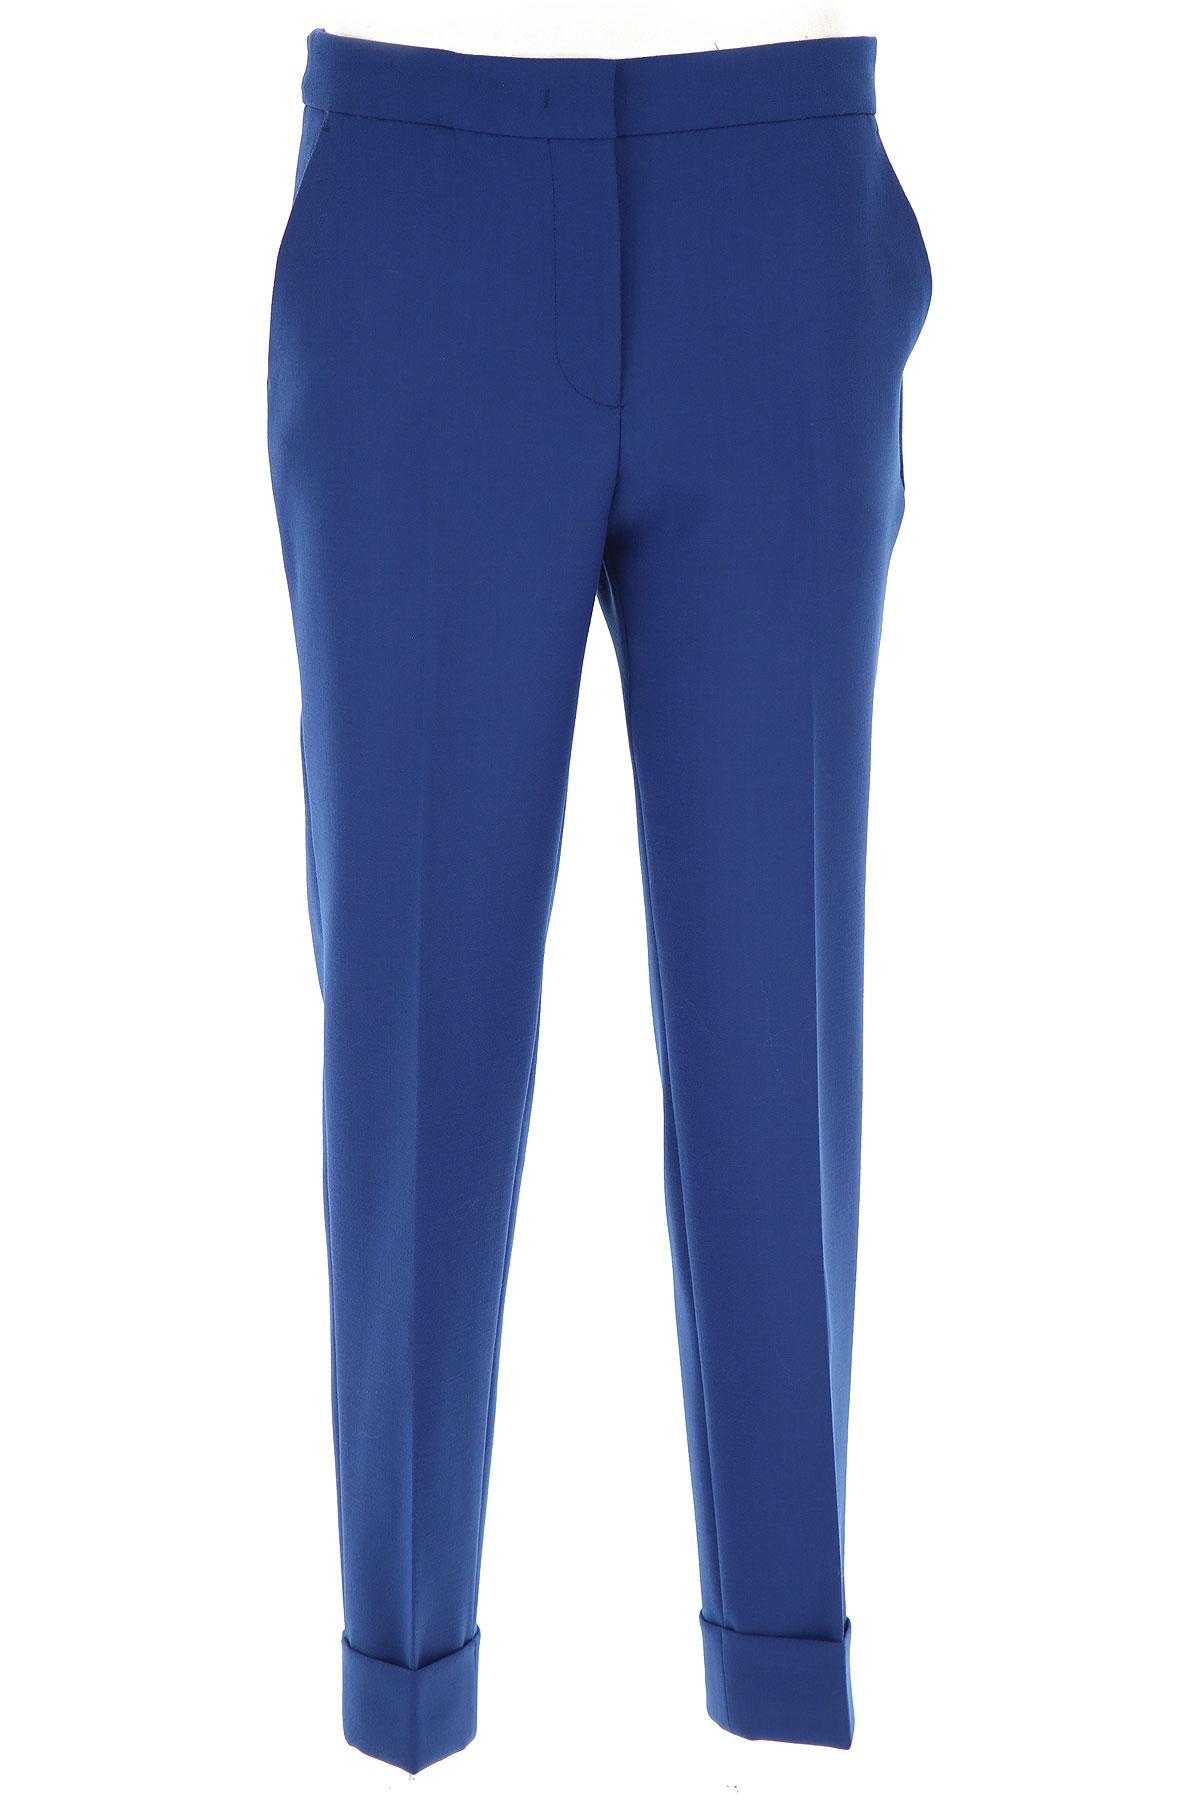 PT01 Pants for Women On Sale, Bluette, polyester, 2019, 26 28 30